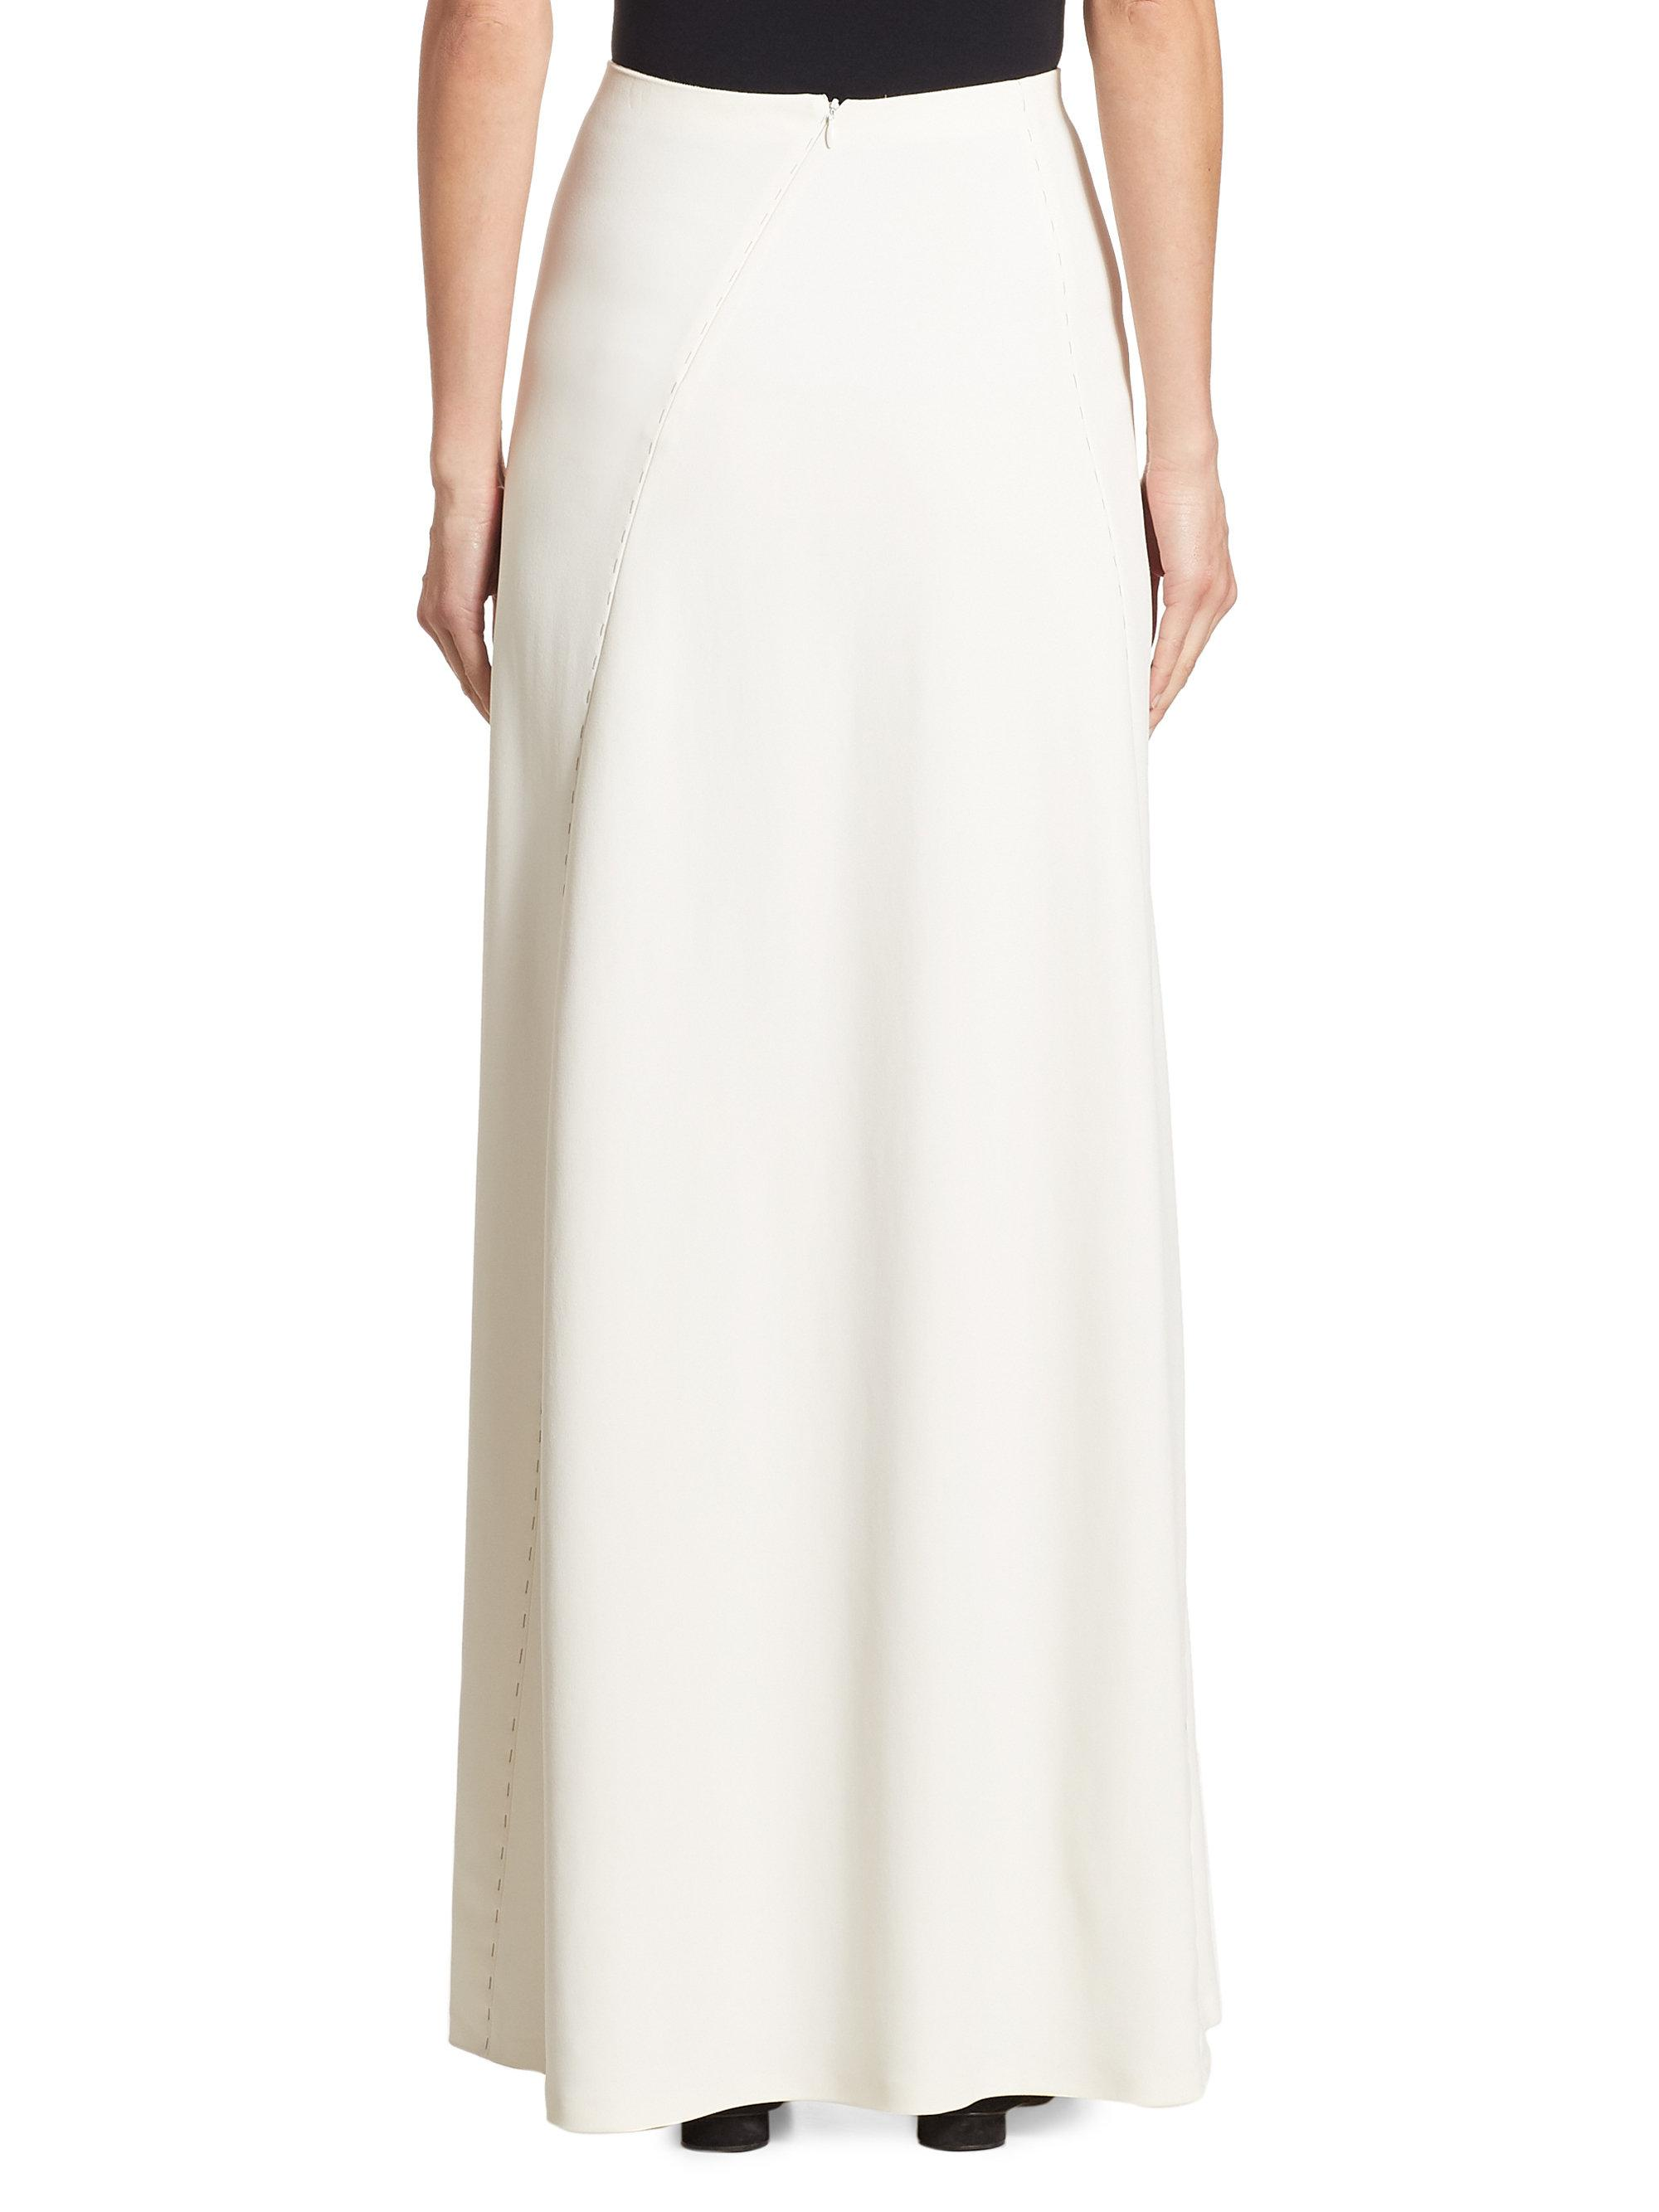 66bb32ab42a The Row Farrow Skirt in White - Lyst